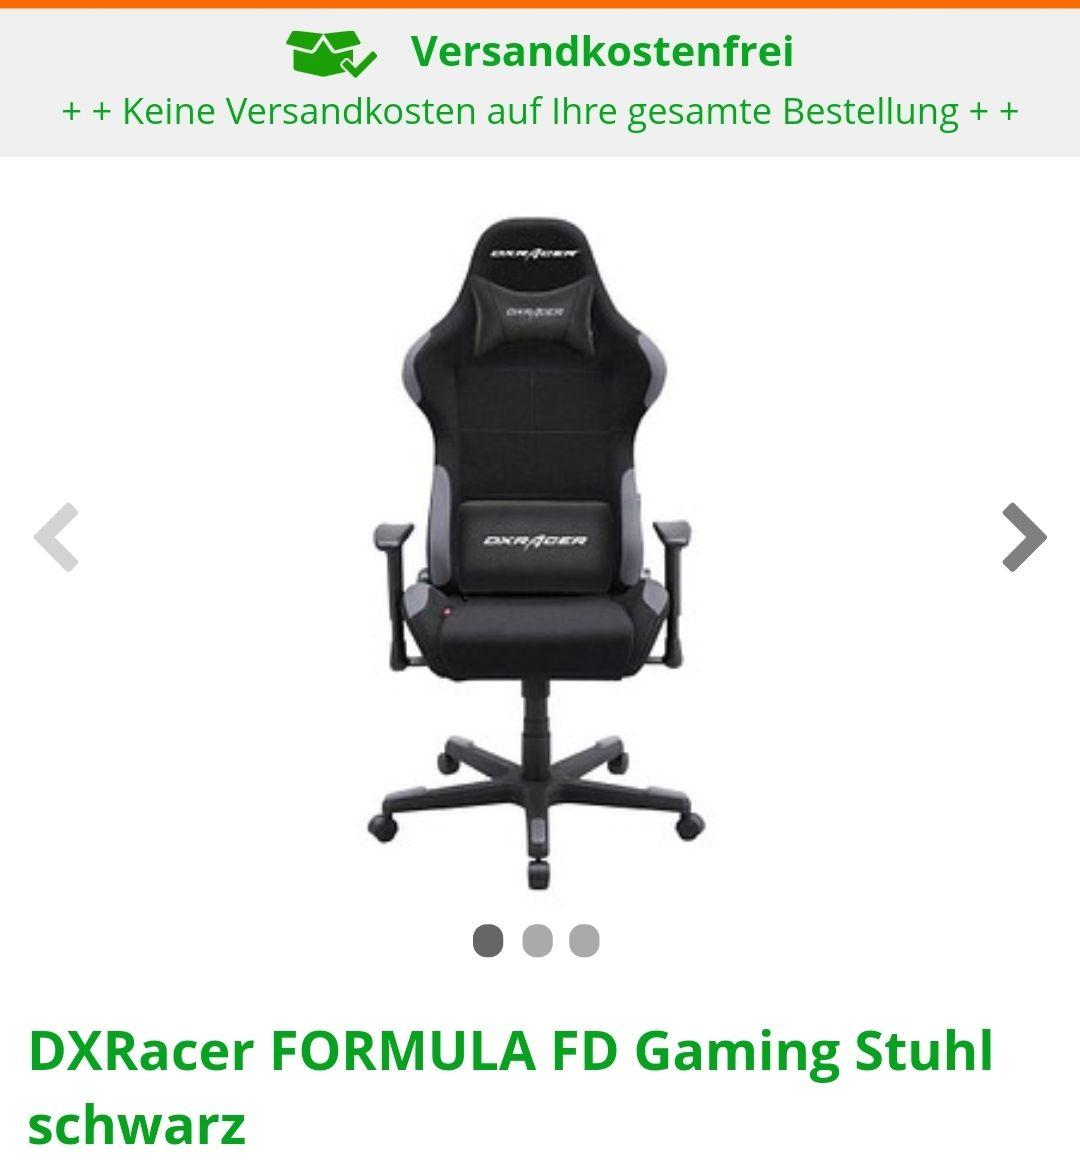 DX Racer FD 01 Gaming Stuhl in schwarz/grau